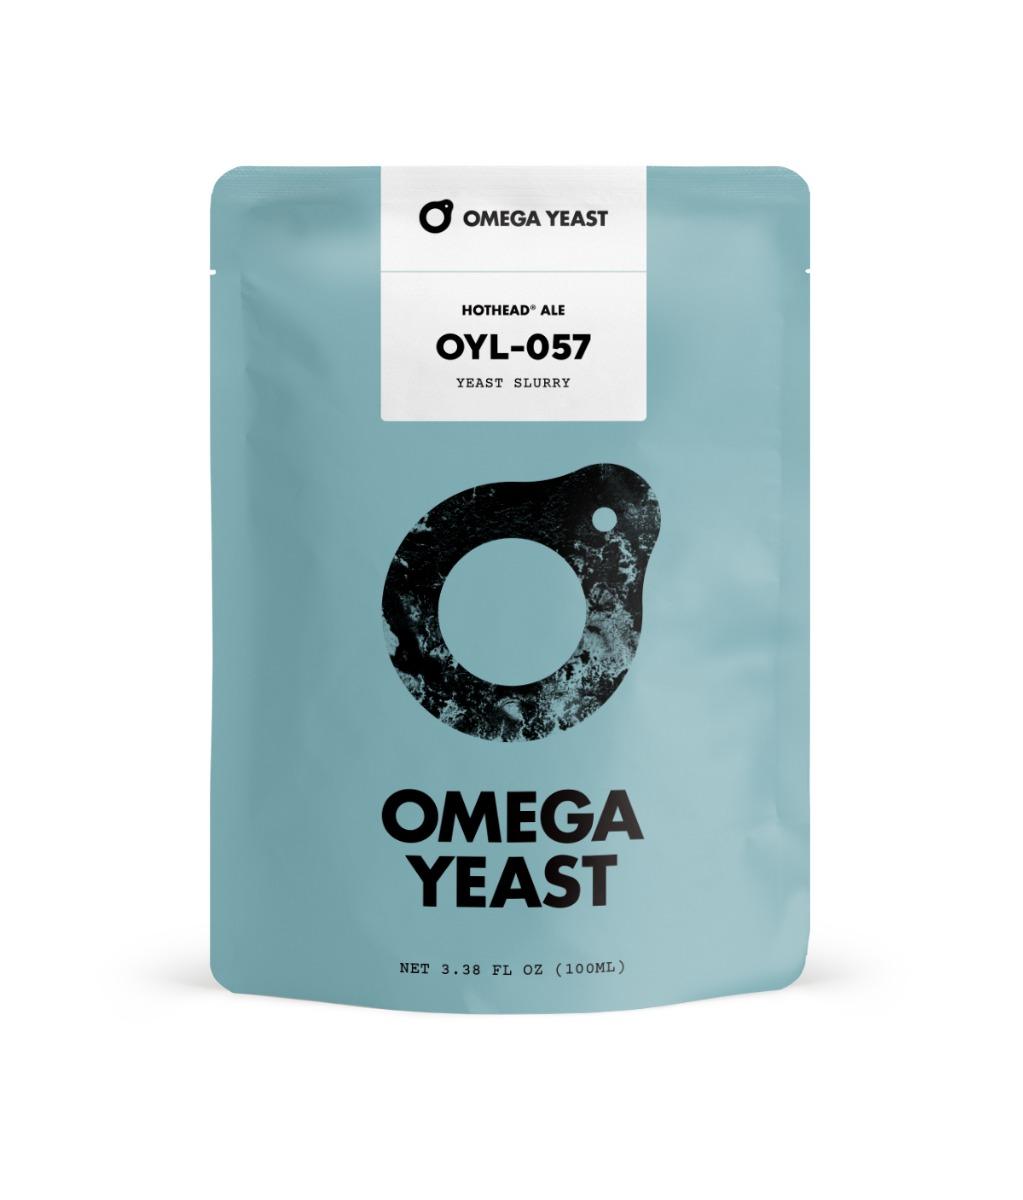 Omega Yeast OYL-057 Hothead Ale